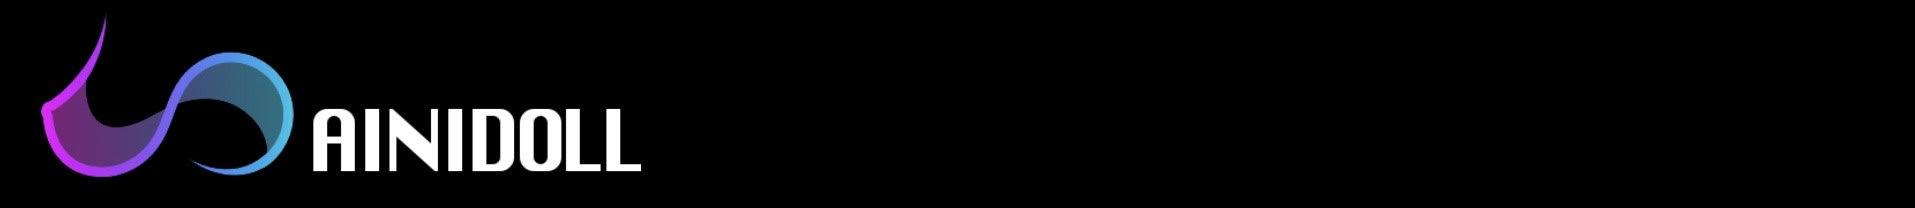 AINIDOLL_1